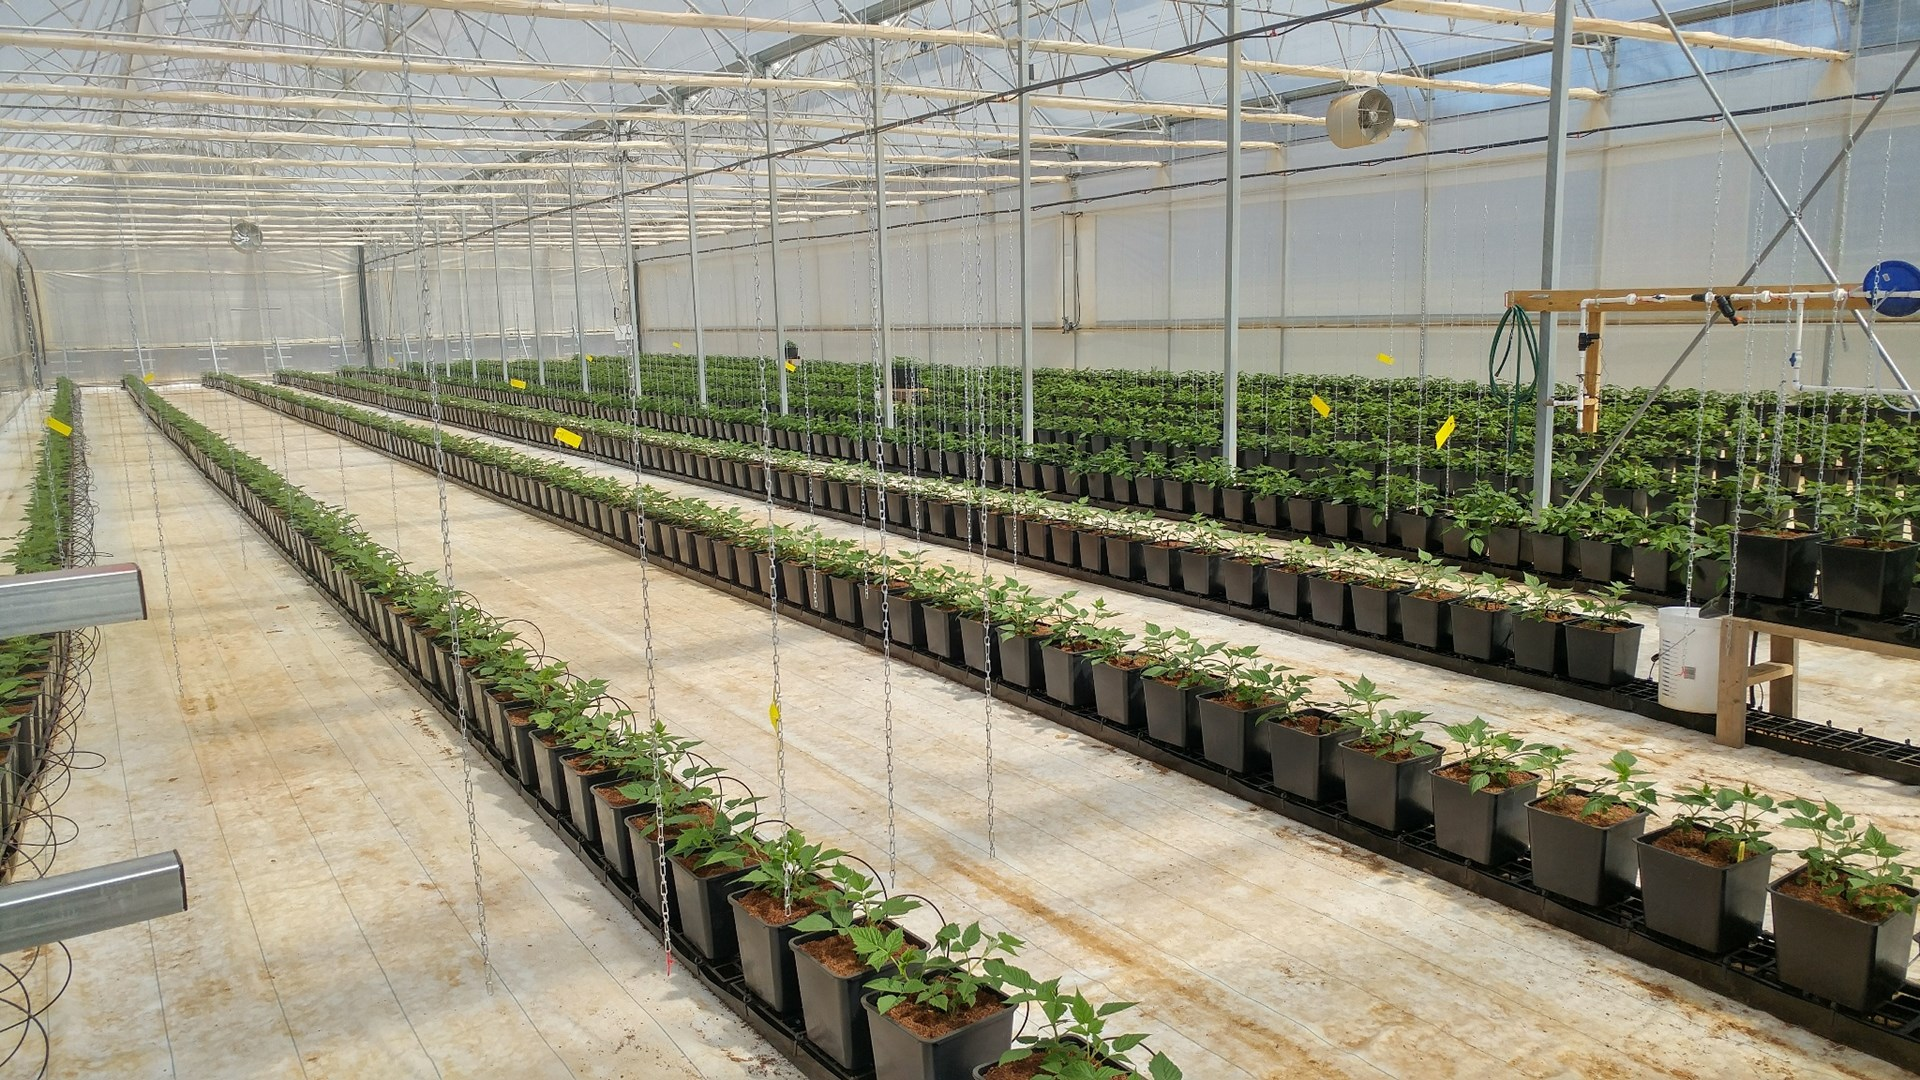 Greene County Greenhouse And Equipment For Sale East Tenn